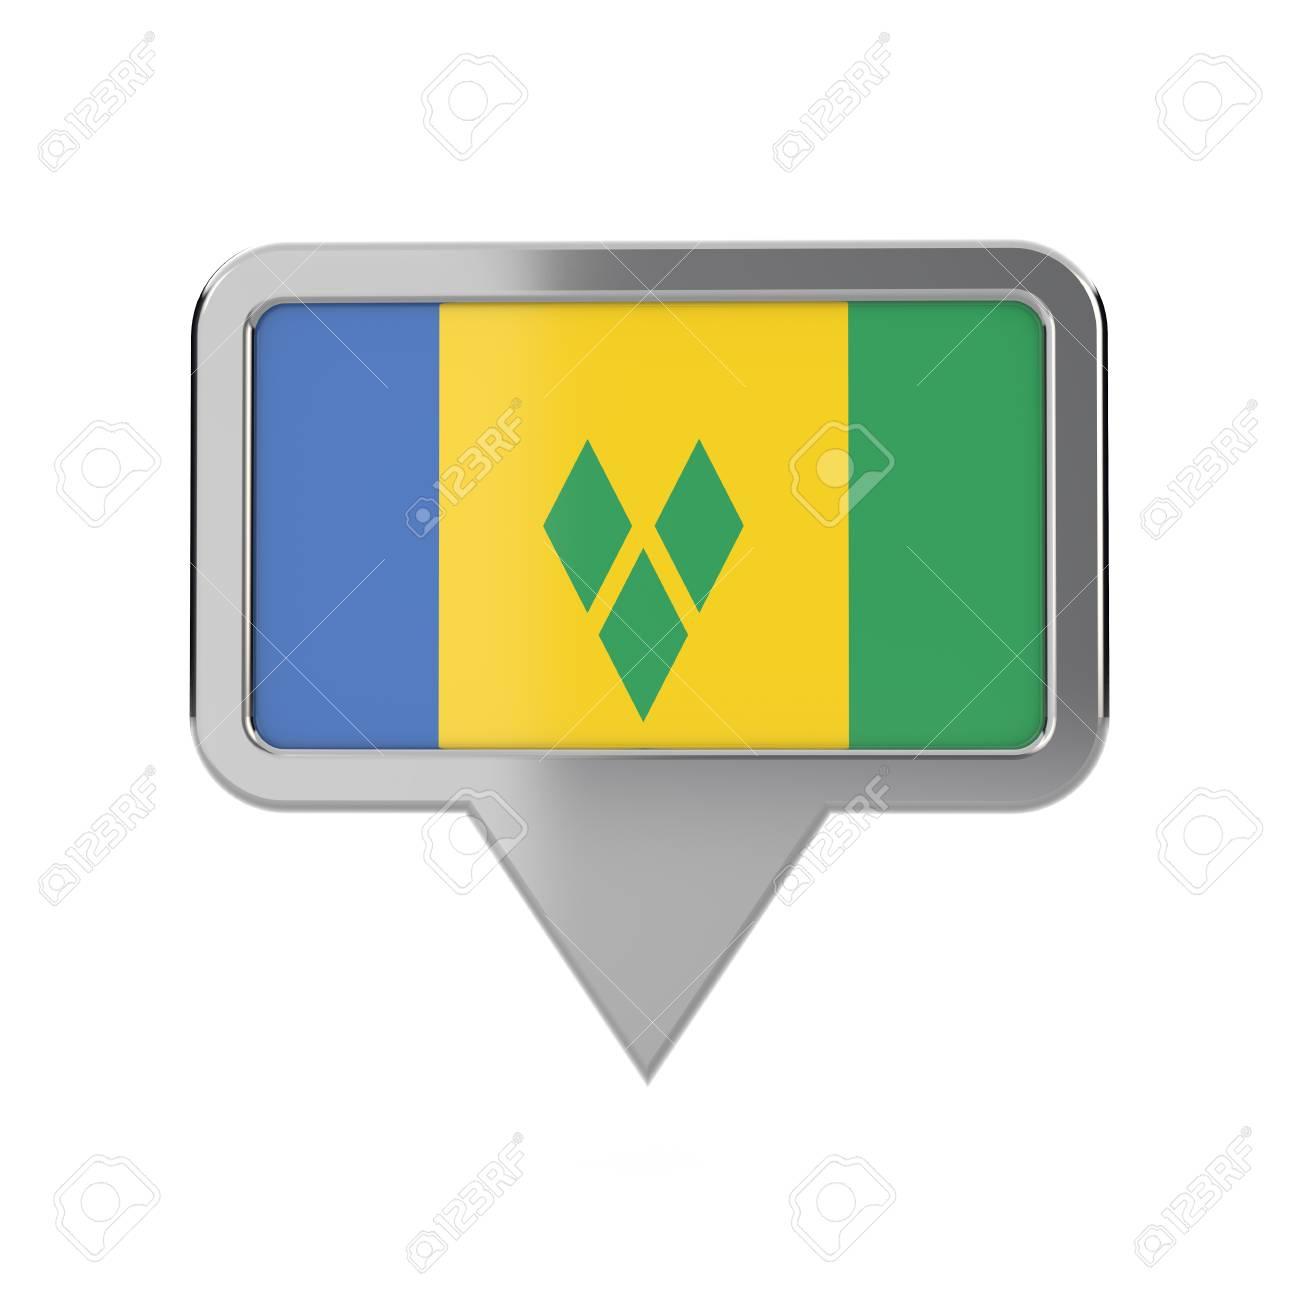 St Vincent flag location marker icon  3D Rendering